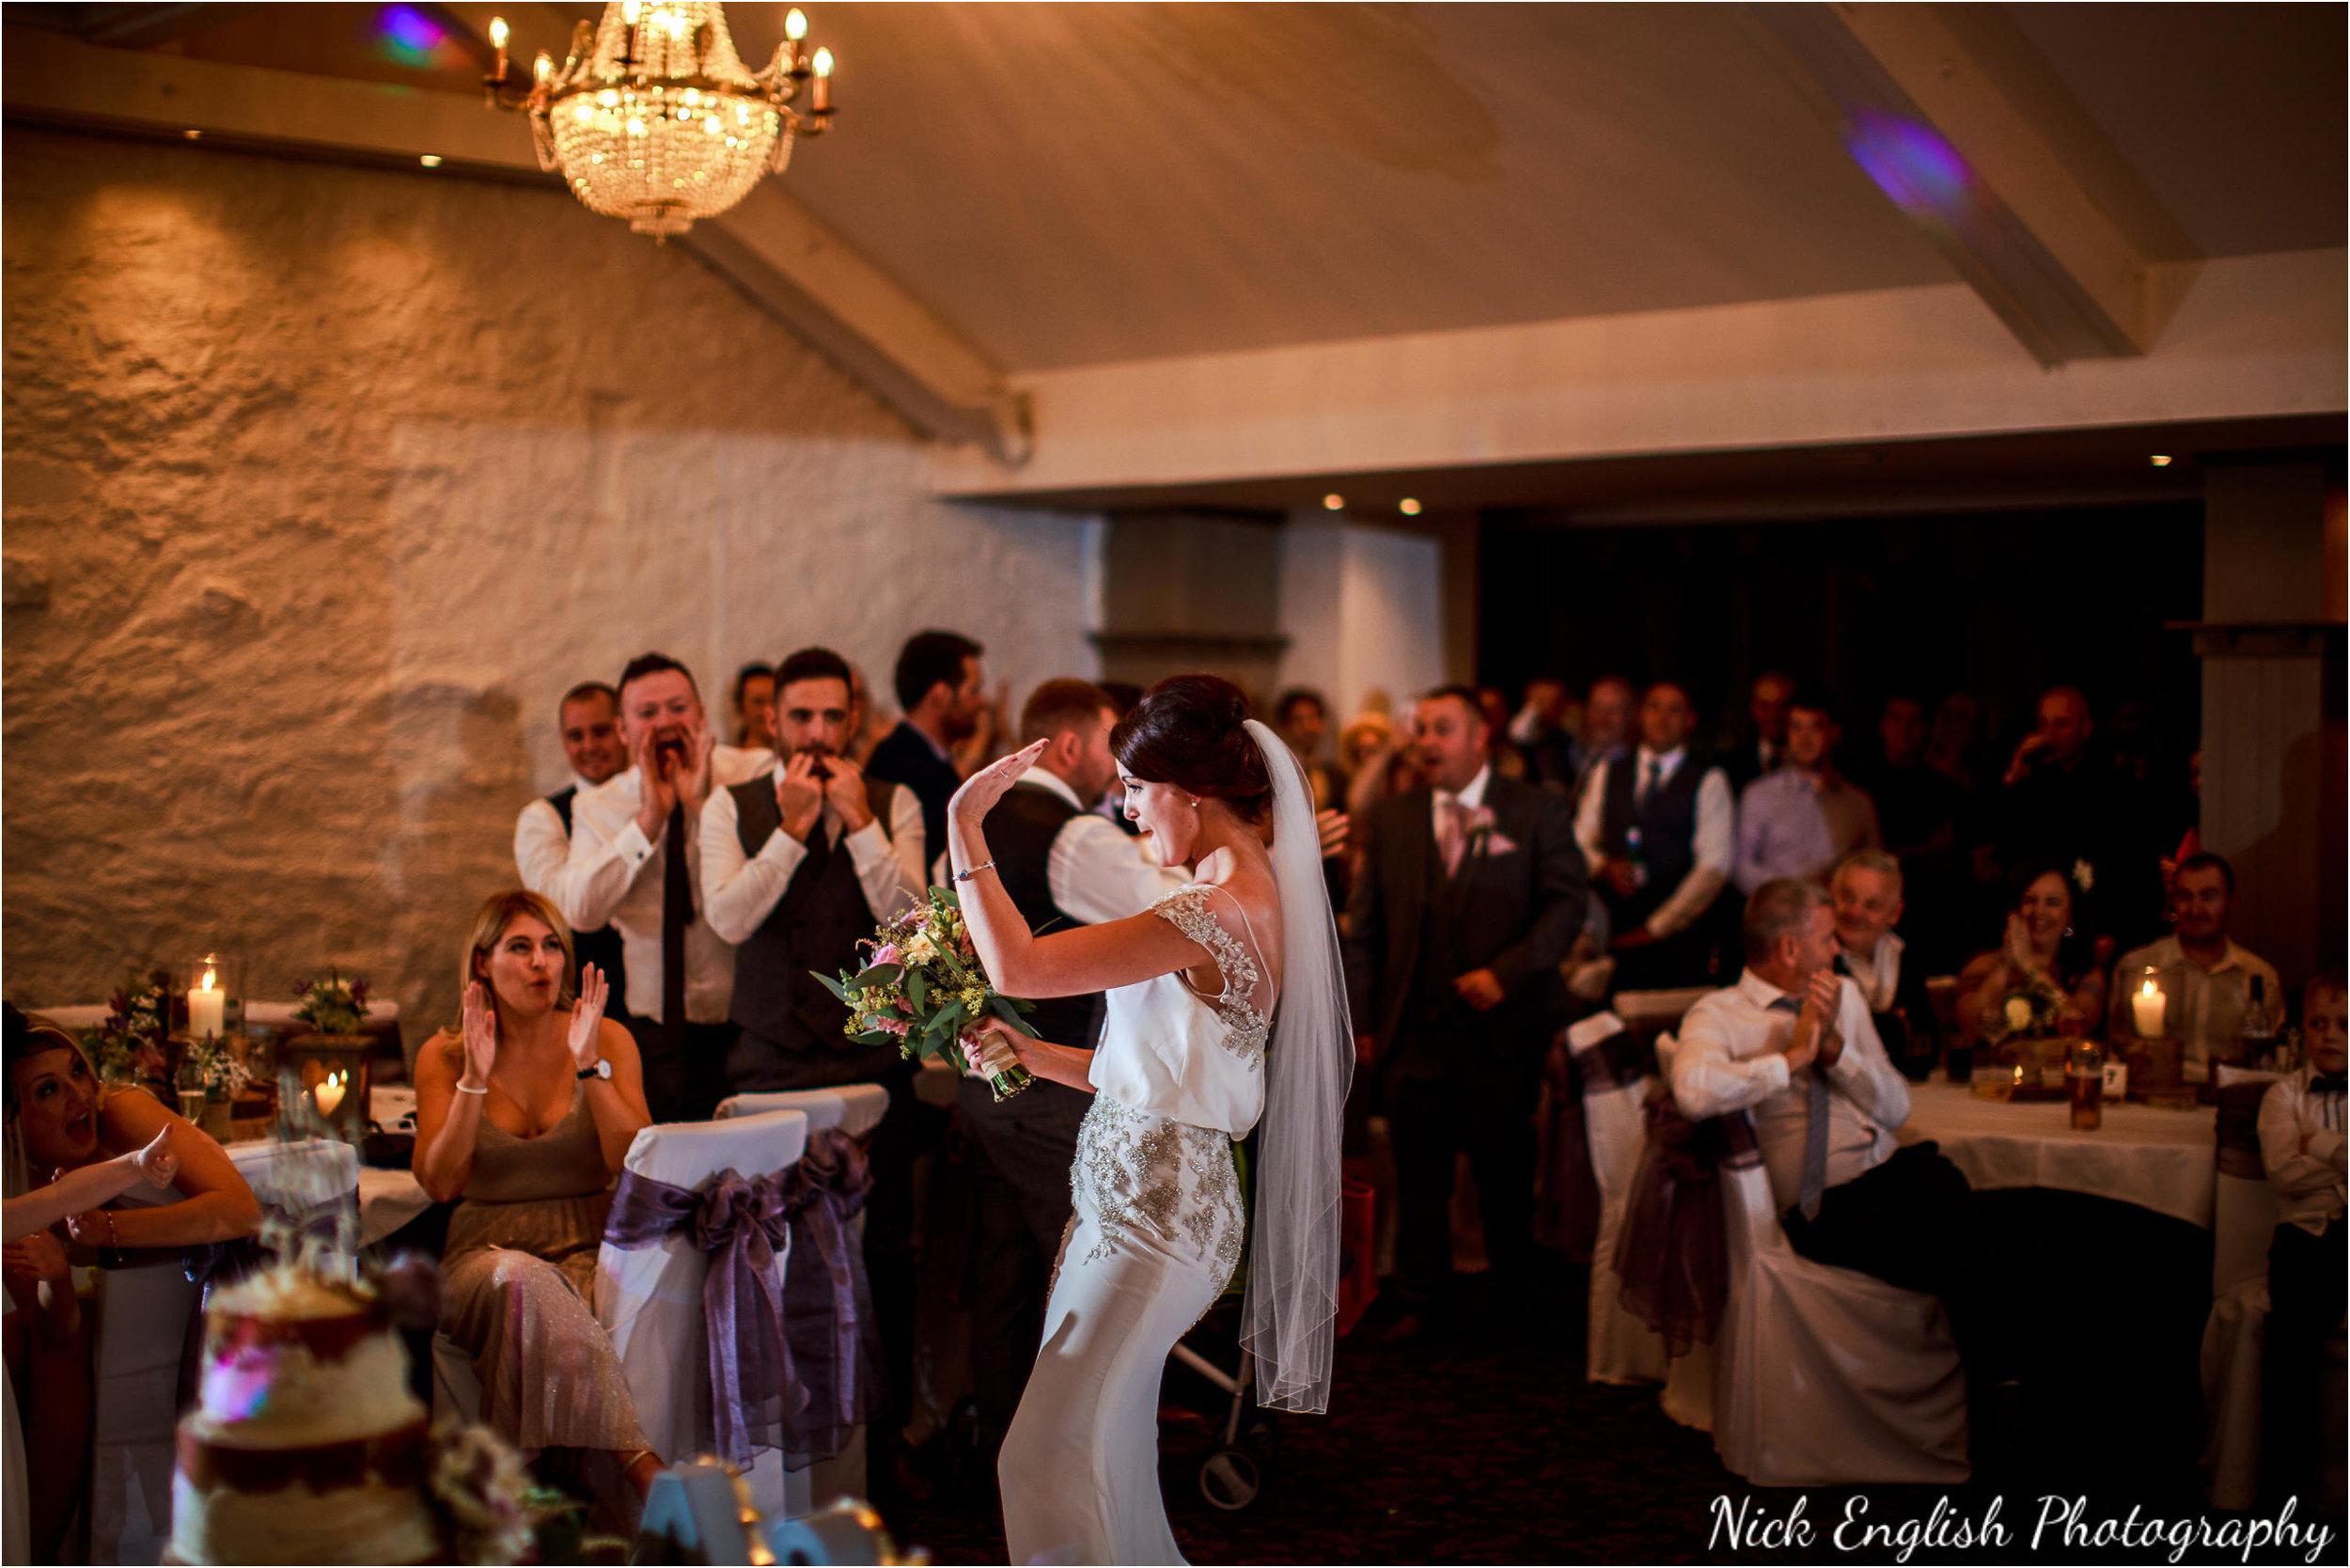 Stacey-Ash-Wedding-Photographs-Stanley-House-Preston-Lancashire-237.jpg